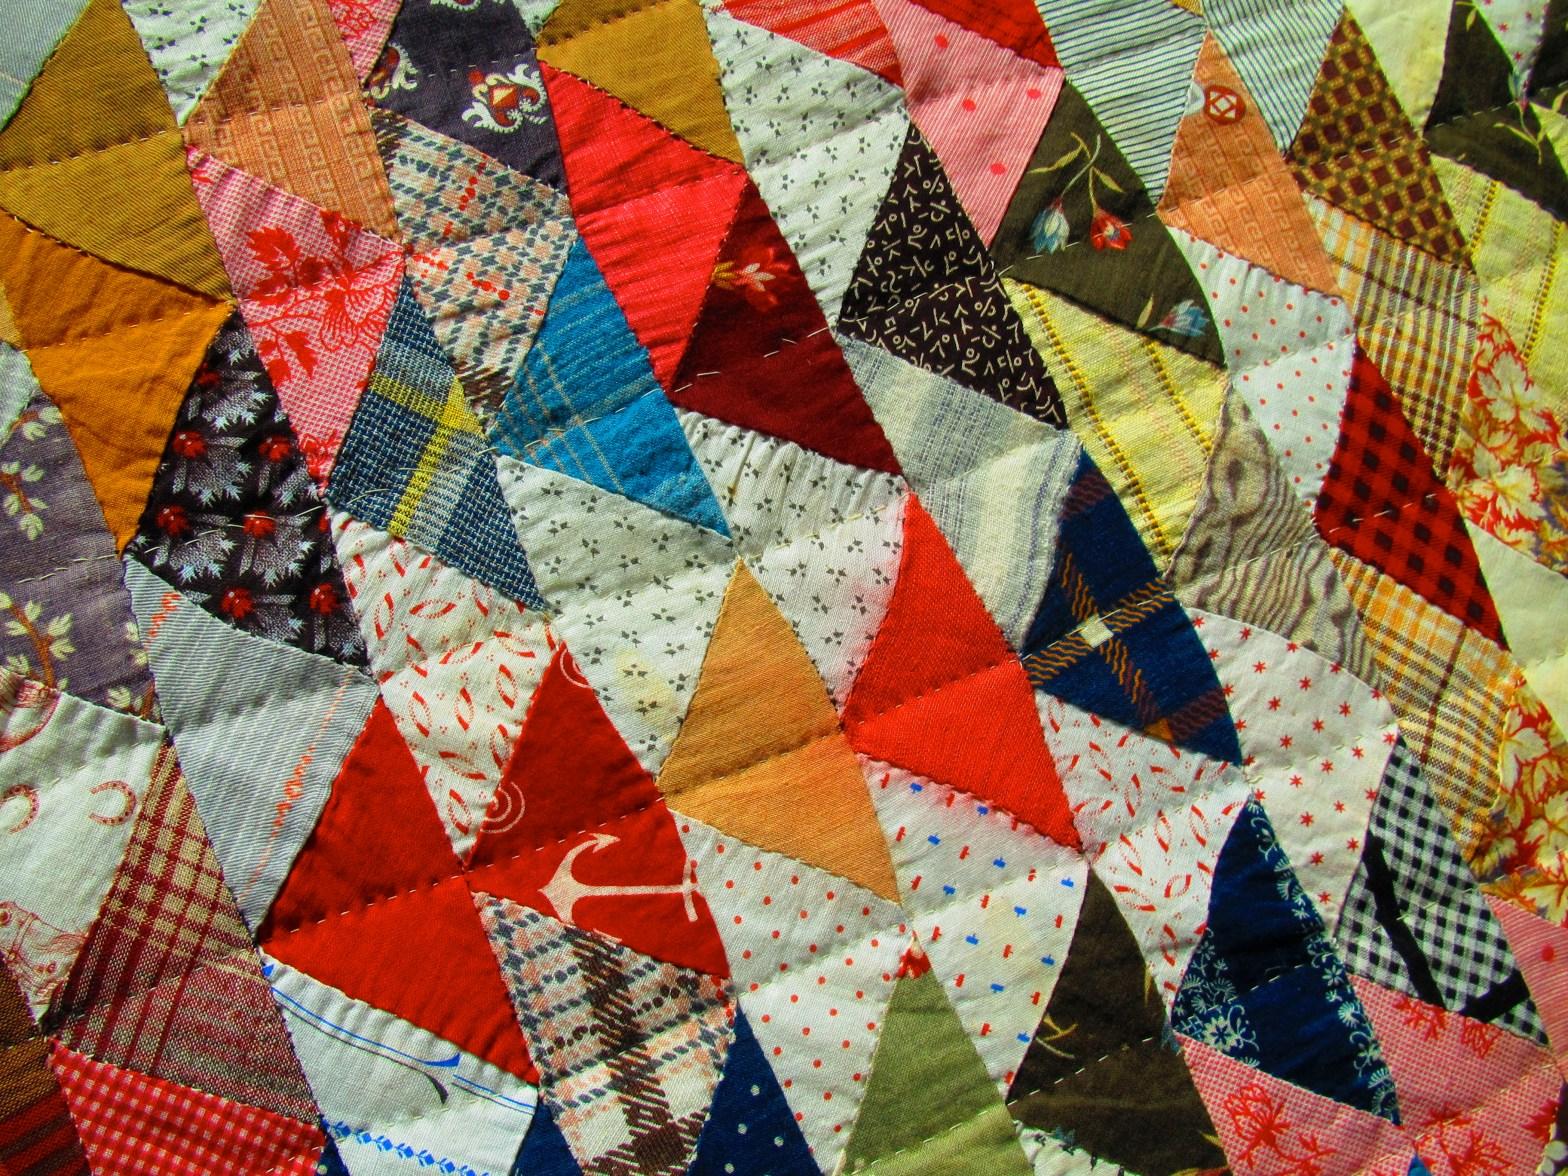 Lane Co. fair beauty 3.1 by jmb_craftypickle on Flickr